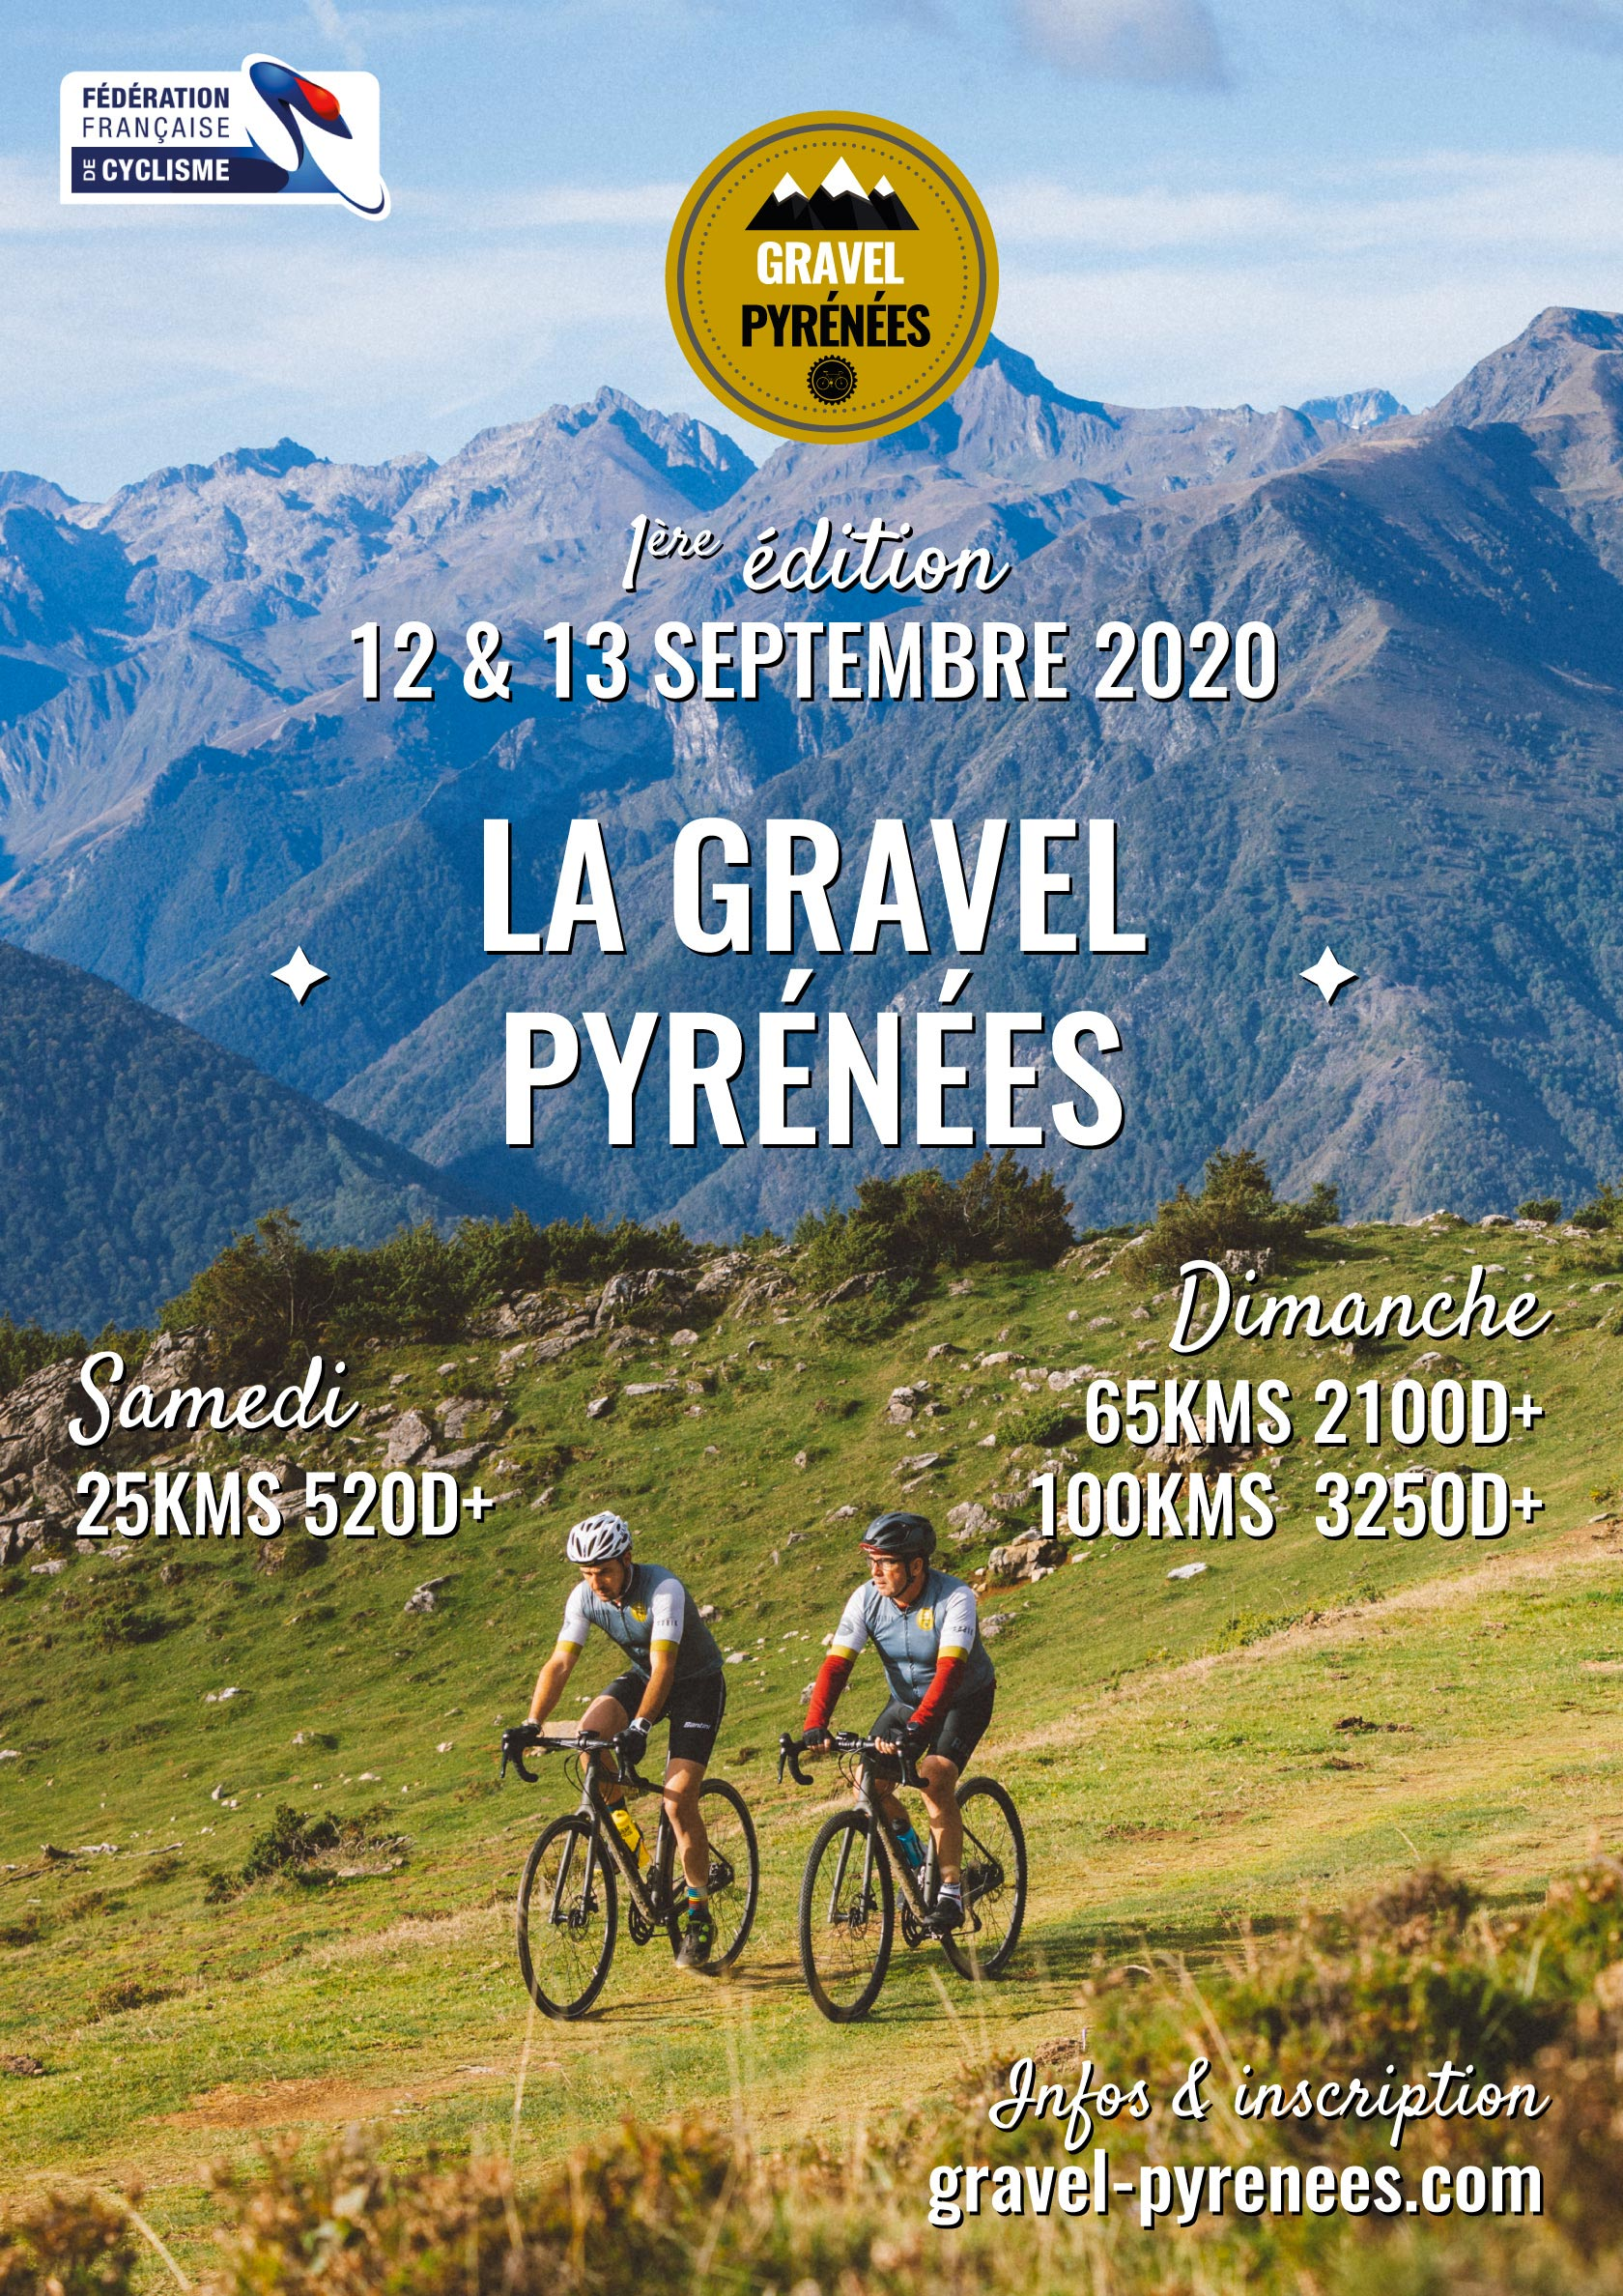 Gravel Pyrénées